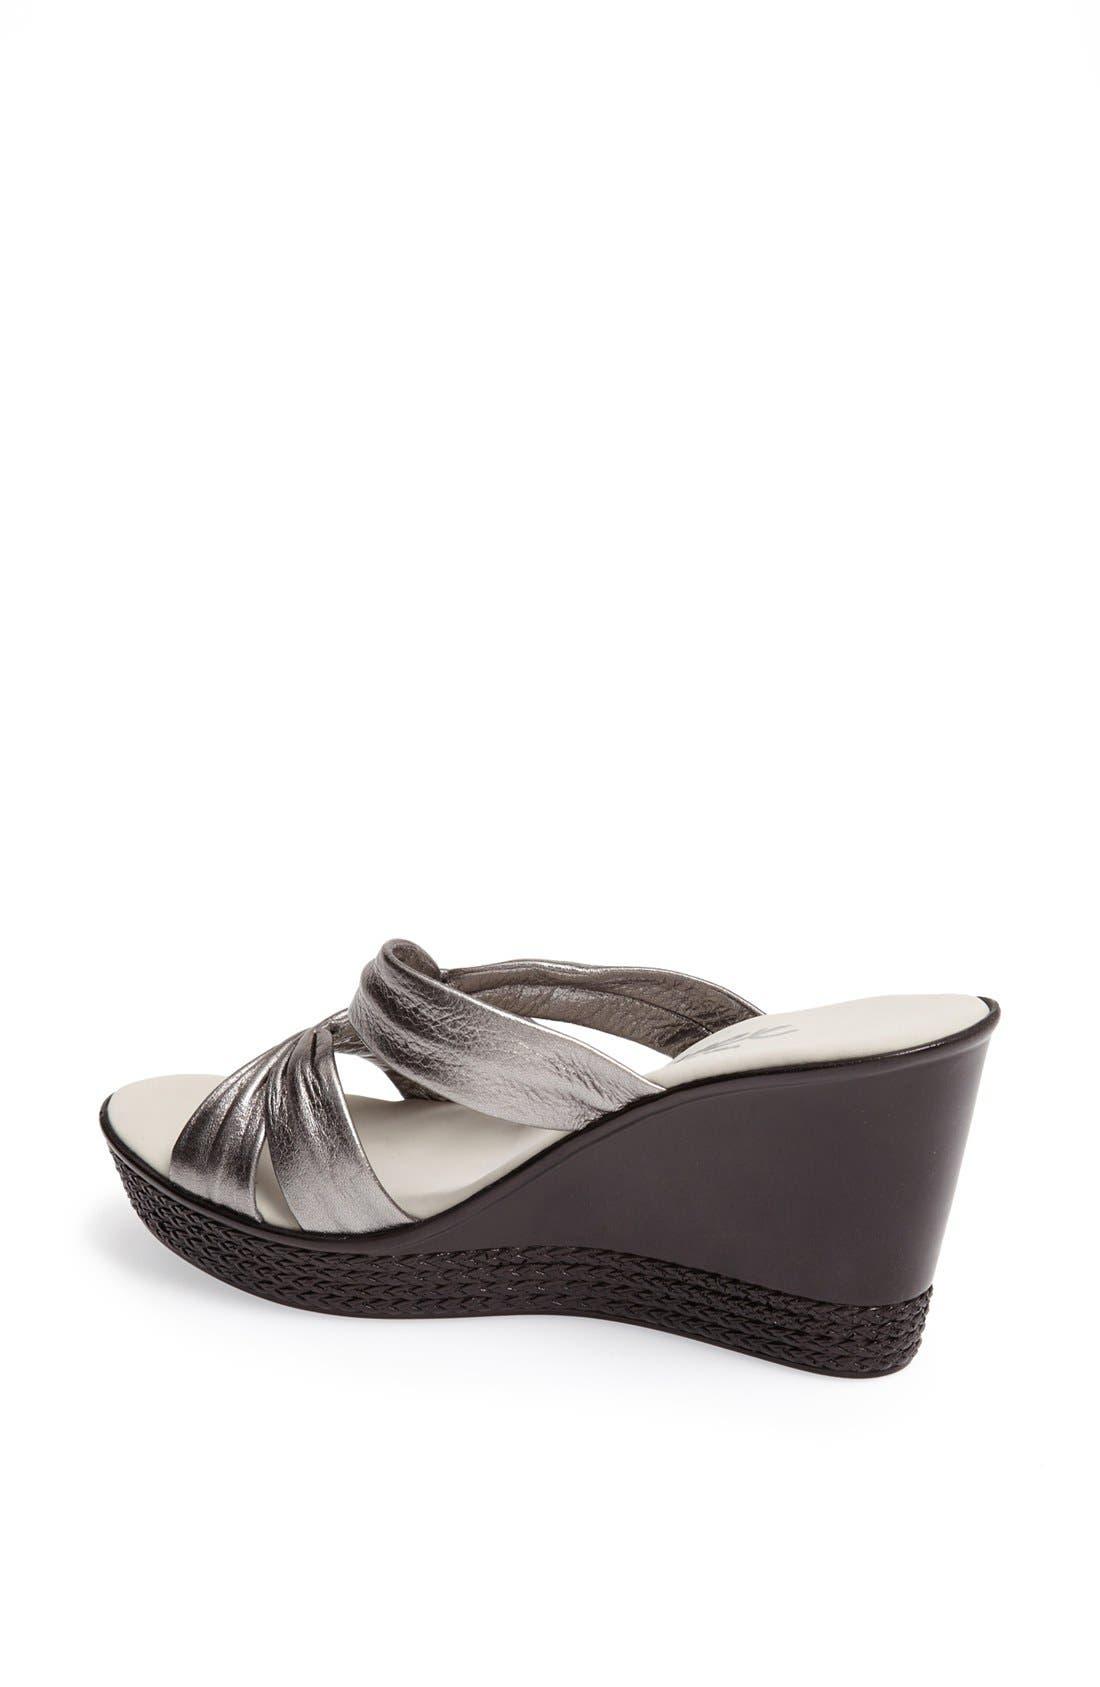 Alternate Image 2  - Onex 'Felicity' Wedge Sandal